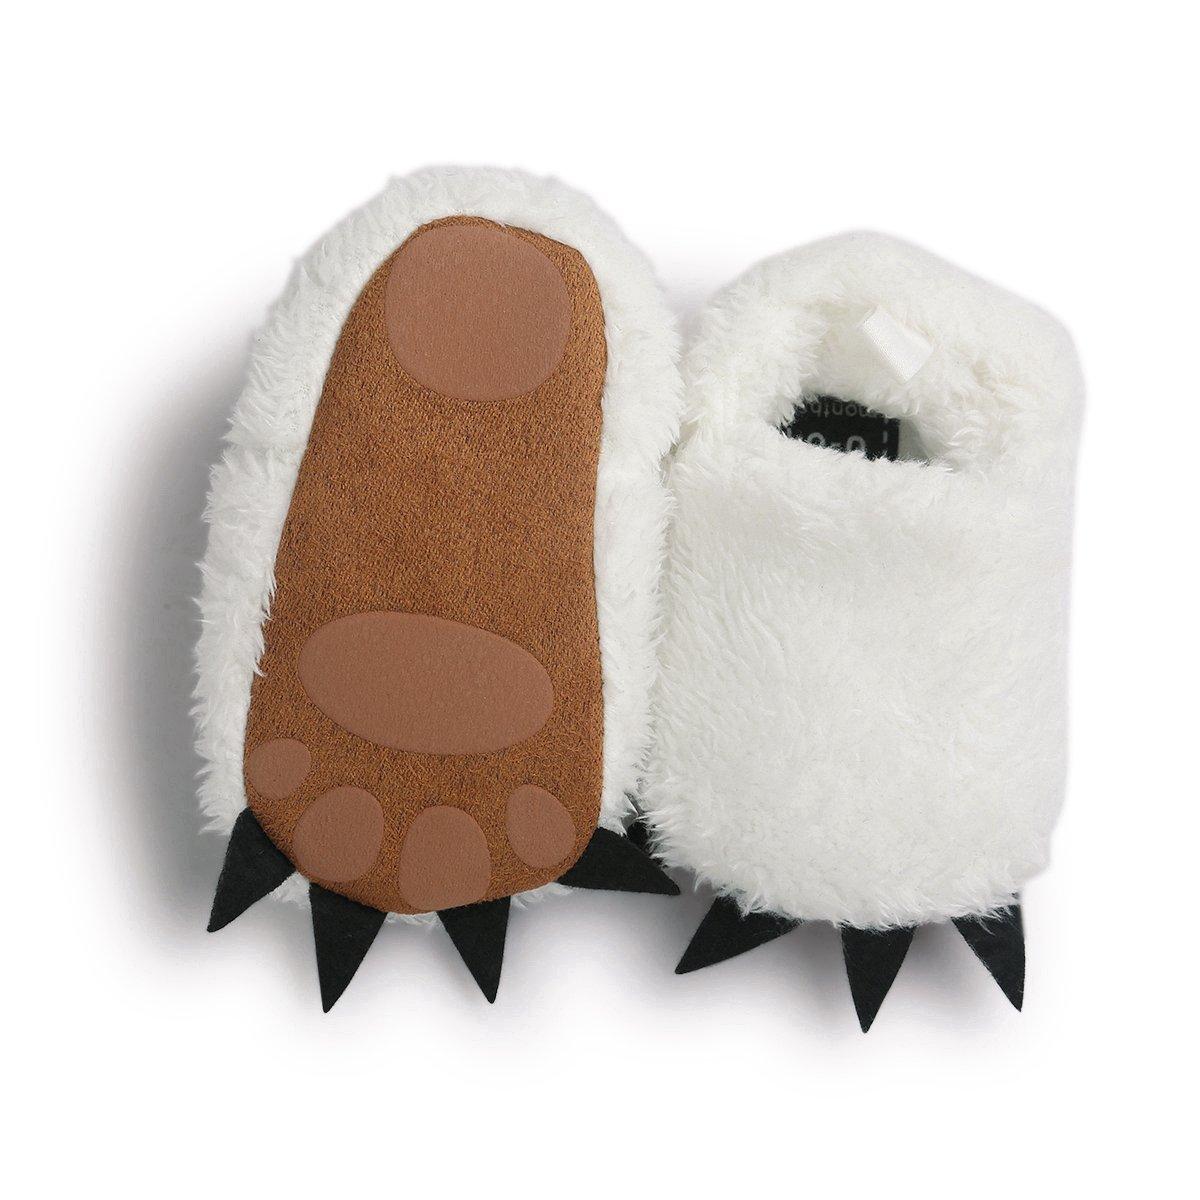 Vanbuy Baby Boys Girls Shoes Bear Paw Animal Slippers Boots Newborn Infant Crib Shoes WB28-White-L by Vanbuy (Image #5)